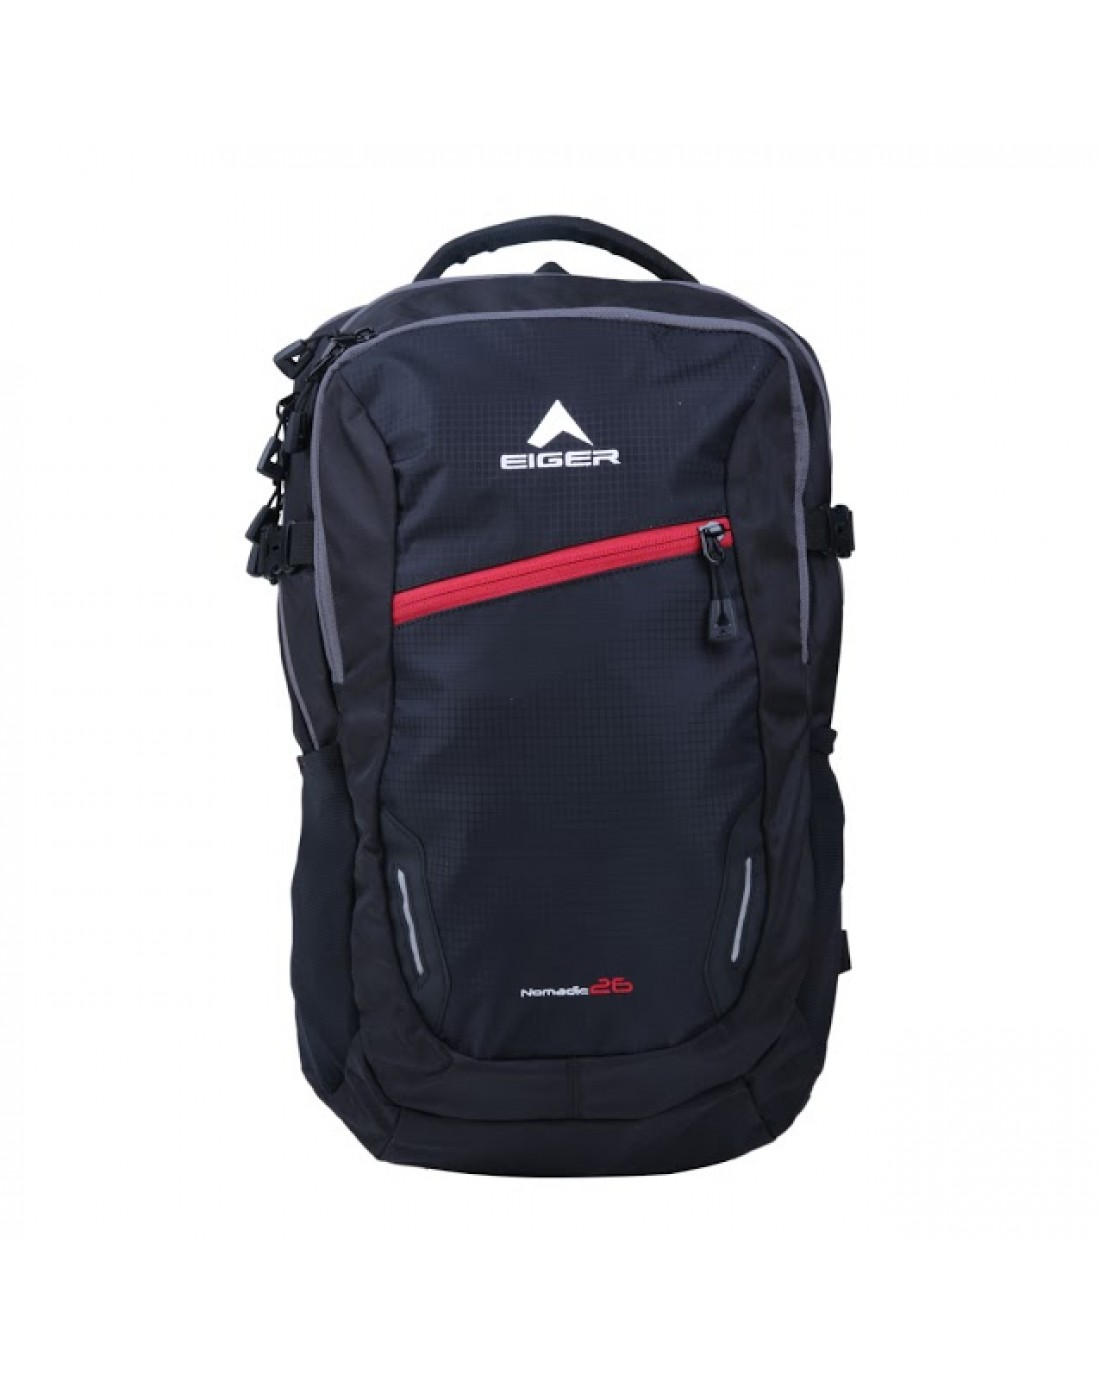 Jual Tas Eiger Daypack Laptop 14 Inch Nomadic 26L